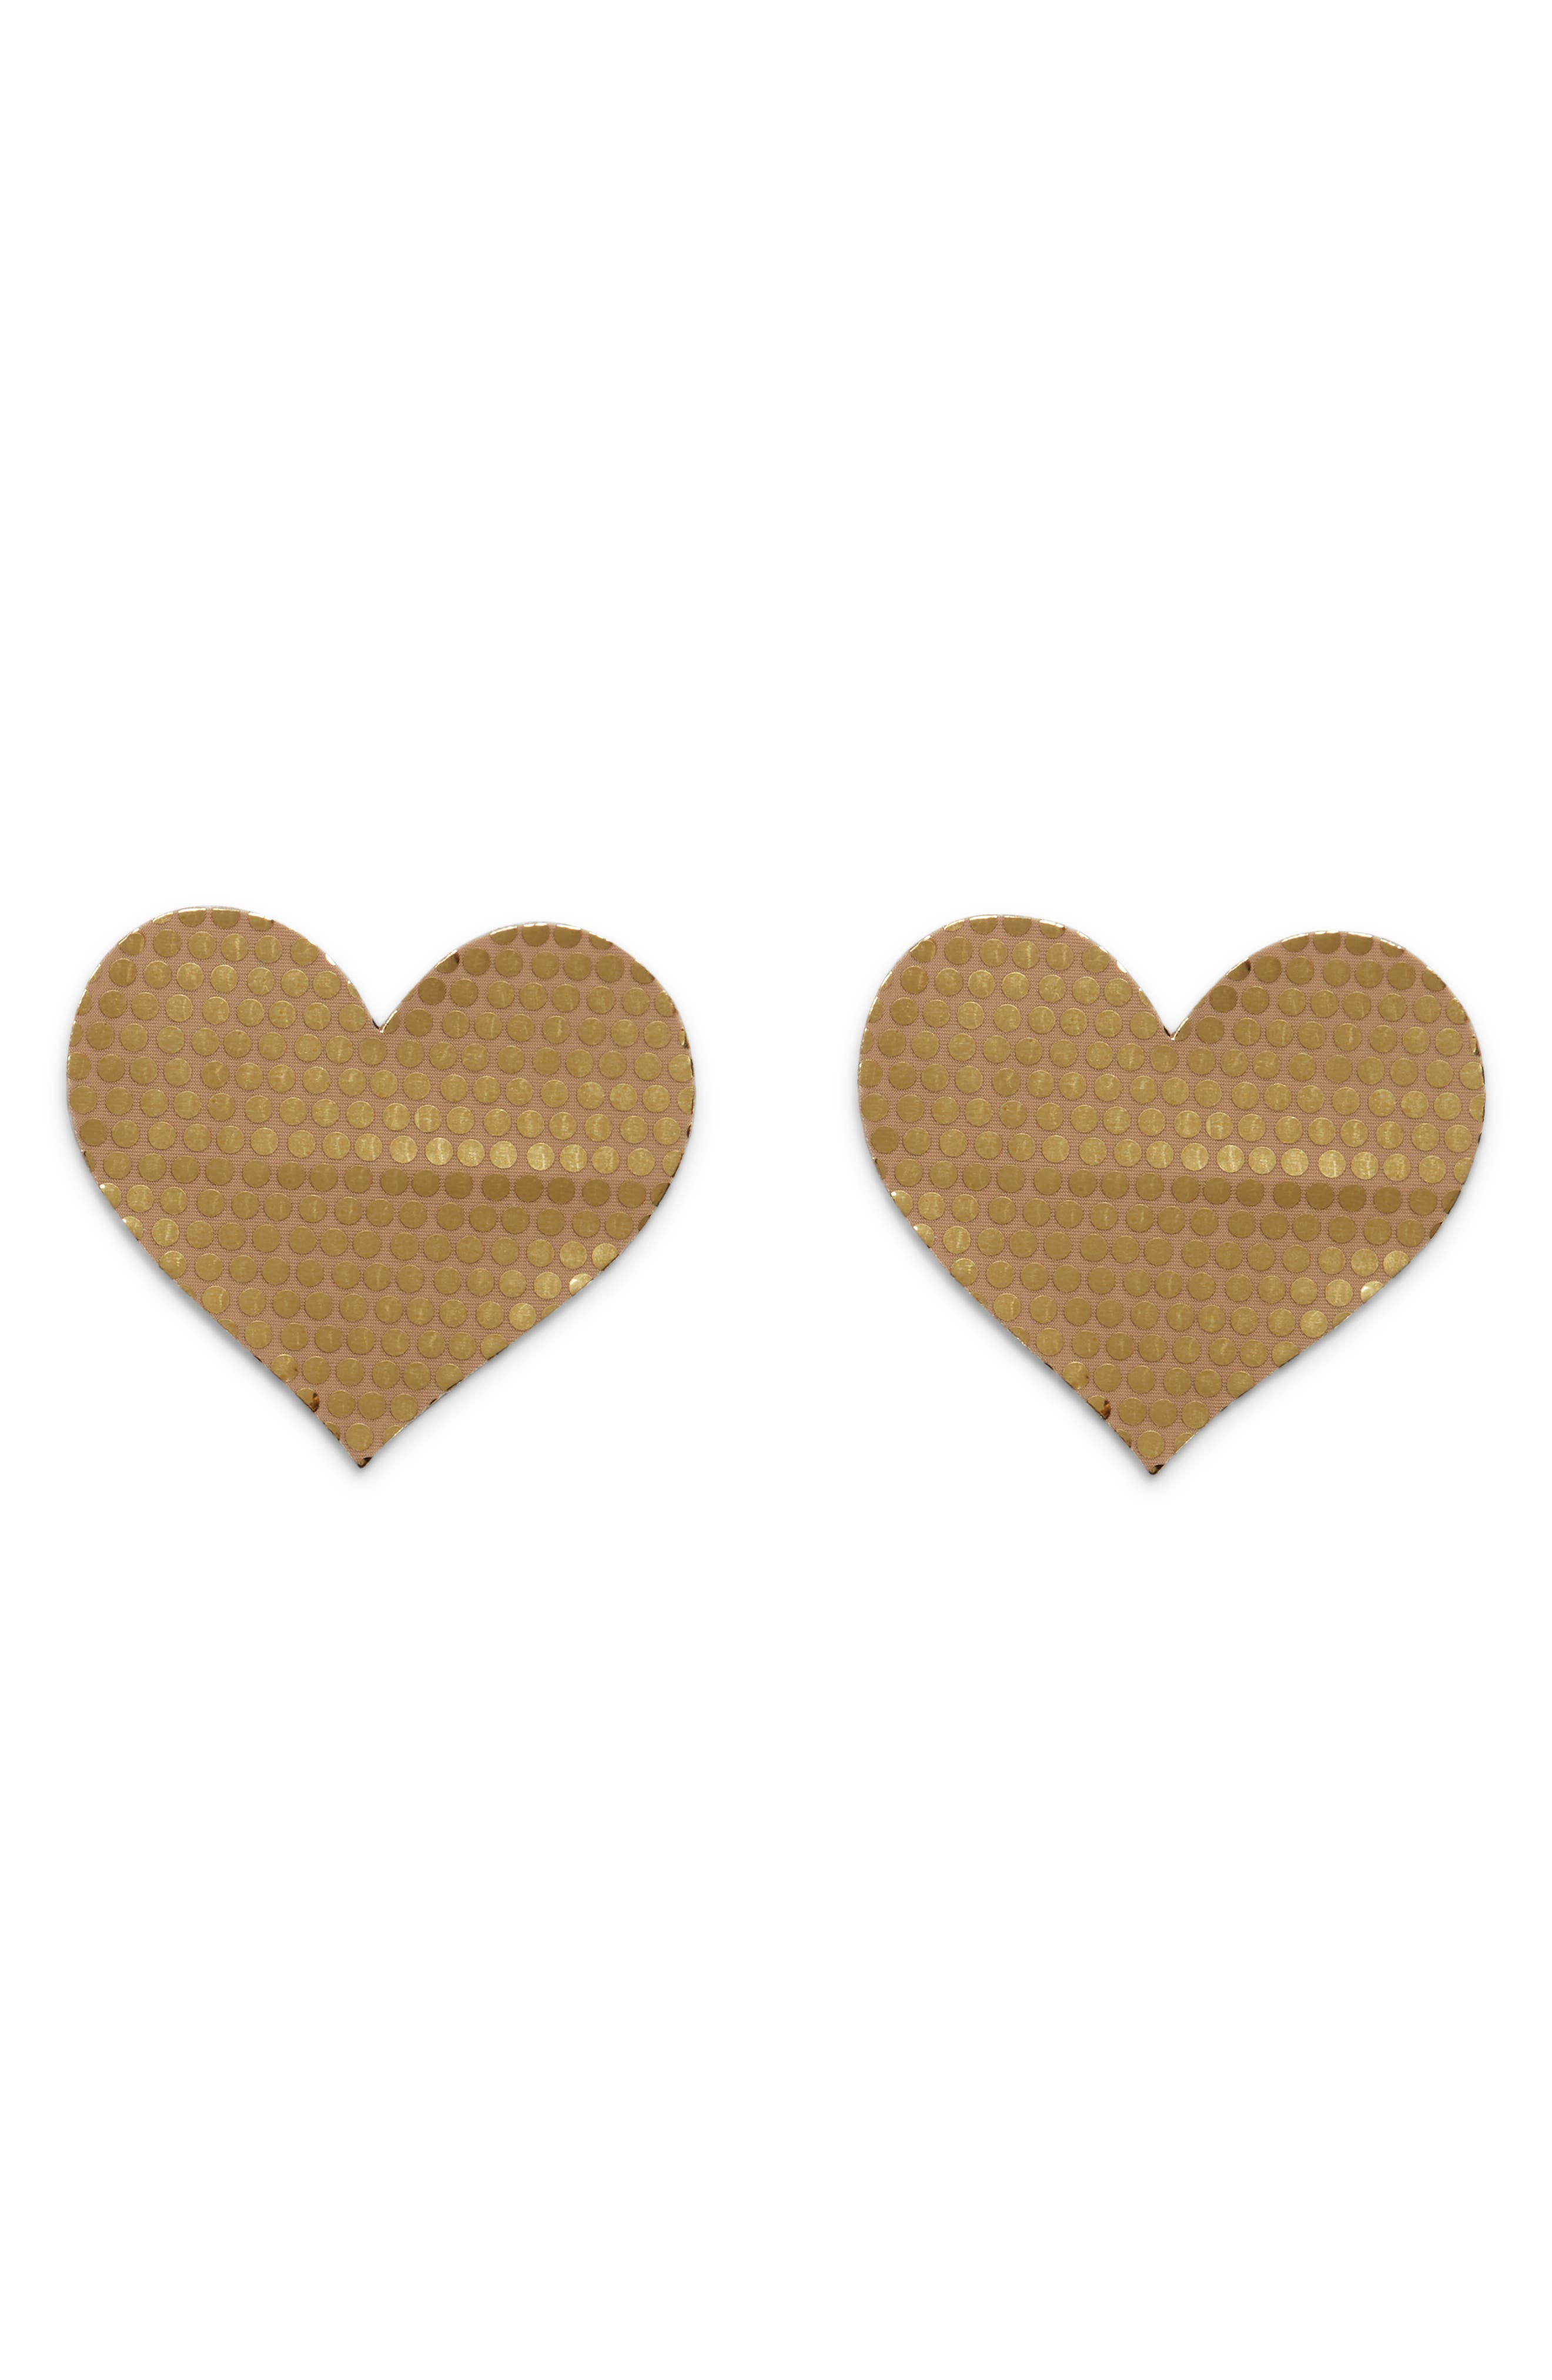 Nippies by Bristols Metallic Dot Heart Nipple Covers